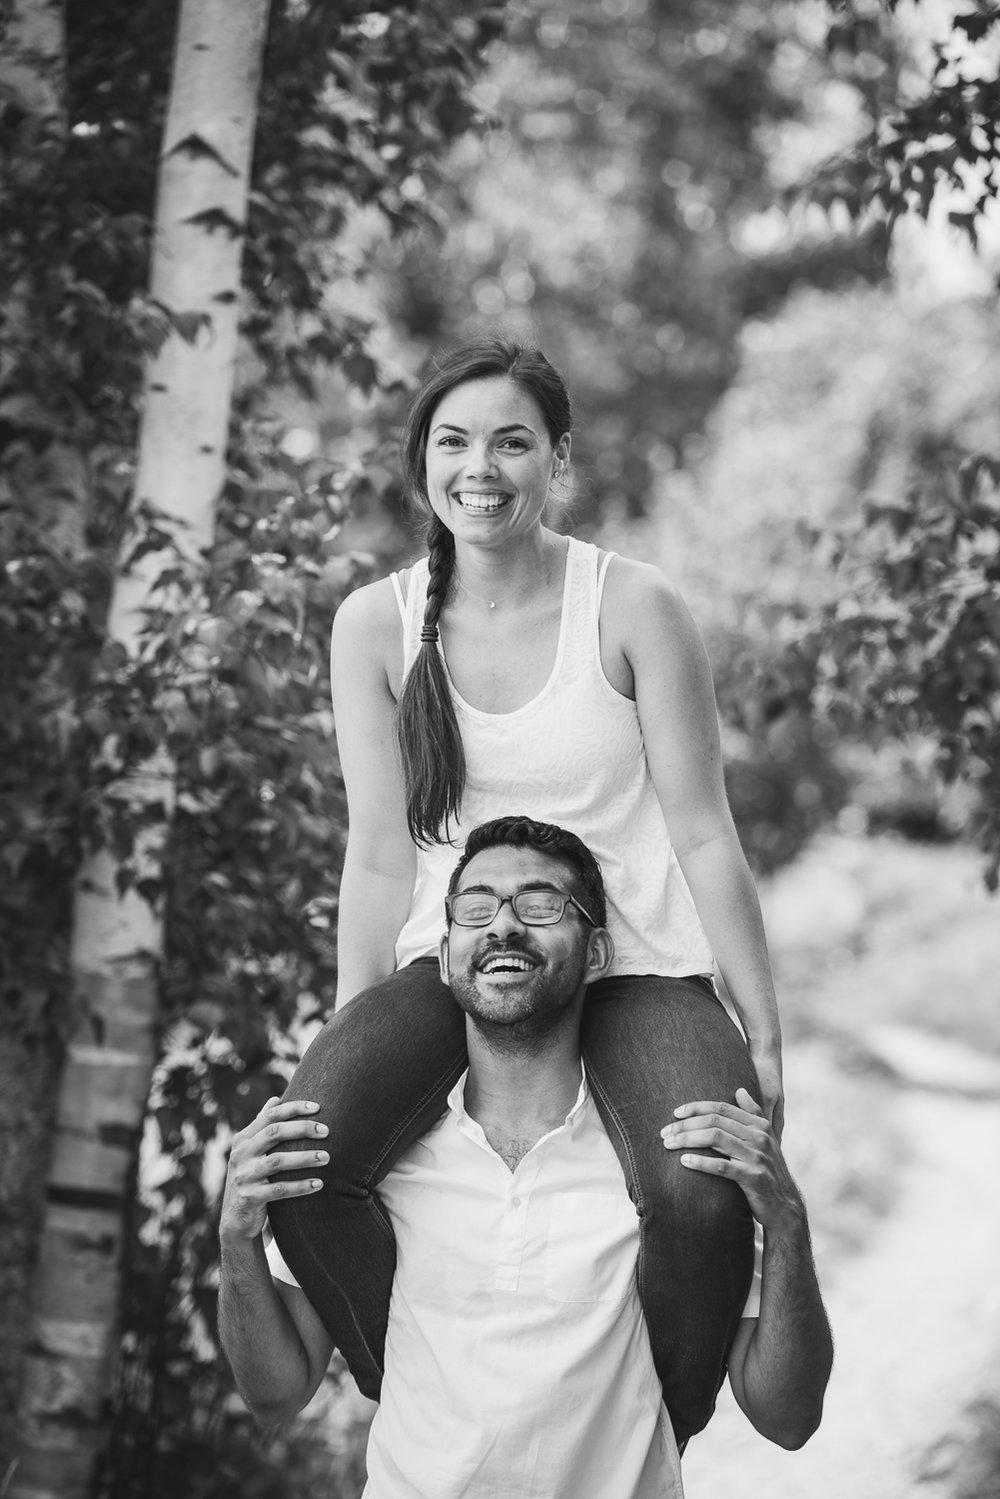 20170708 - Tiffany Pranshu Engagement LR-33.jpg